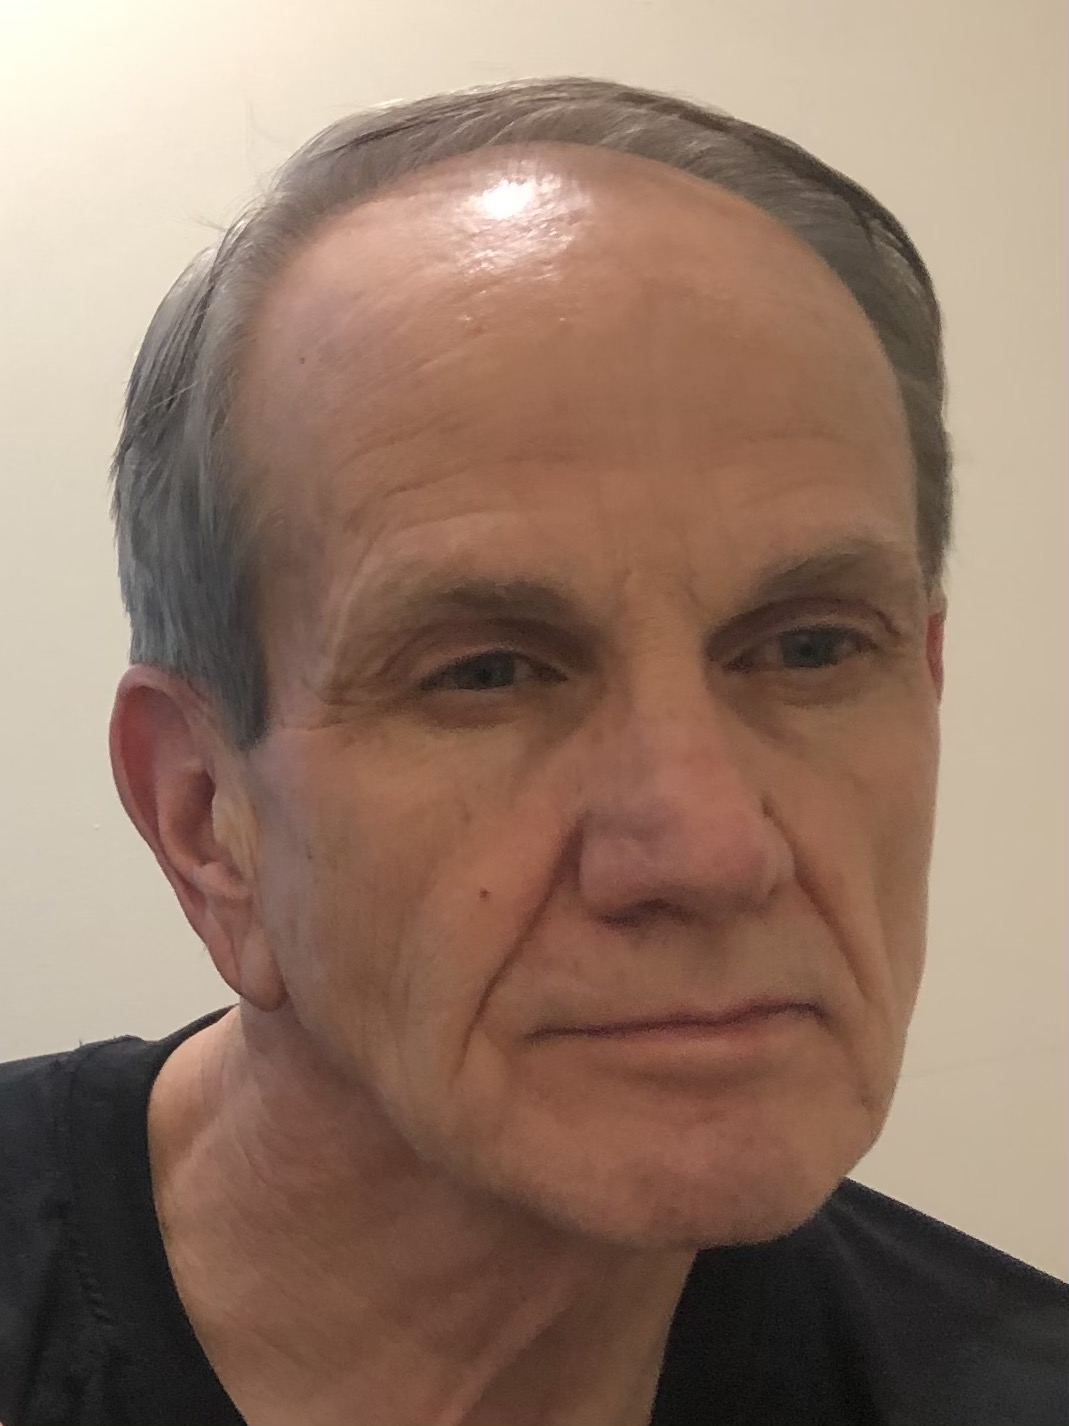 David Flohr